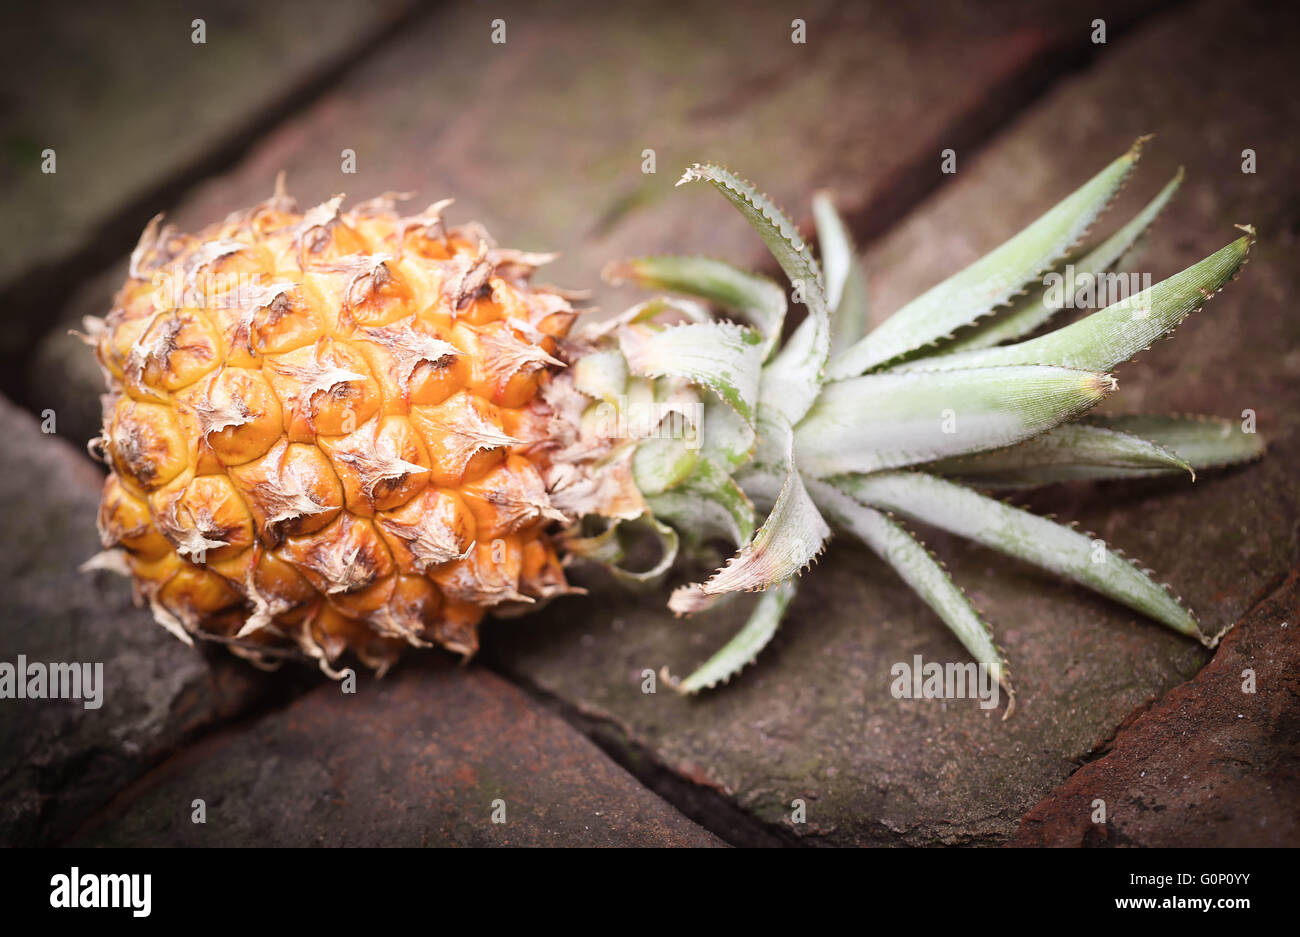 Popular honey queen pineapple of Bangladesh on brick surface - Stock Image